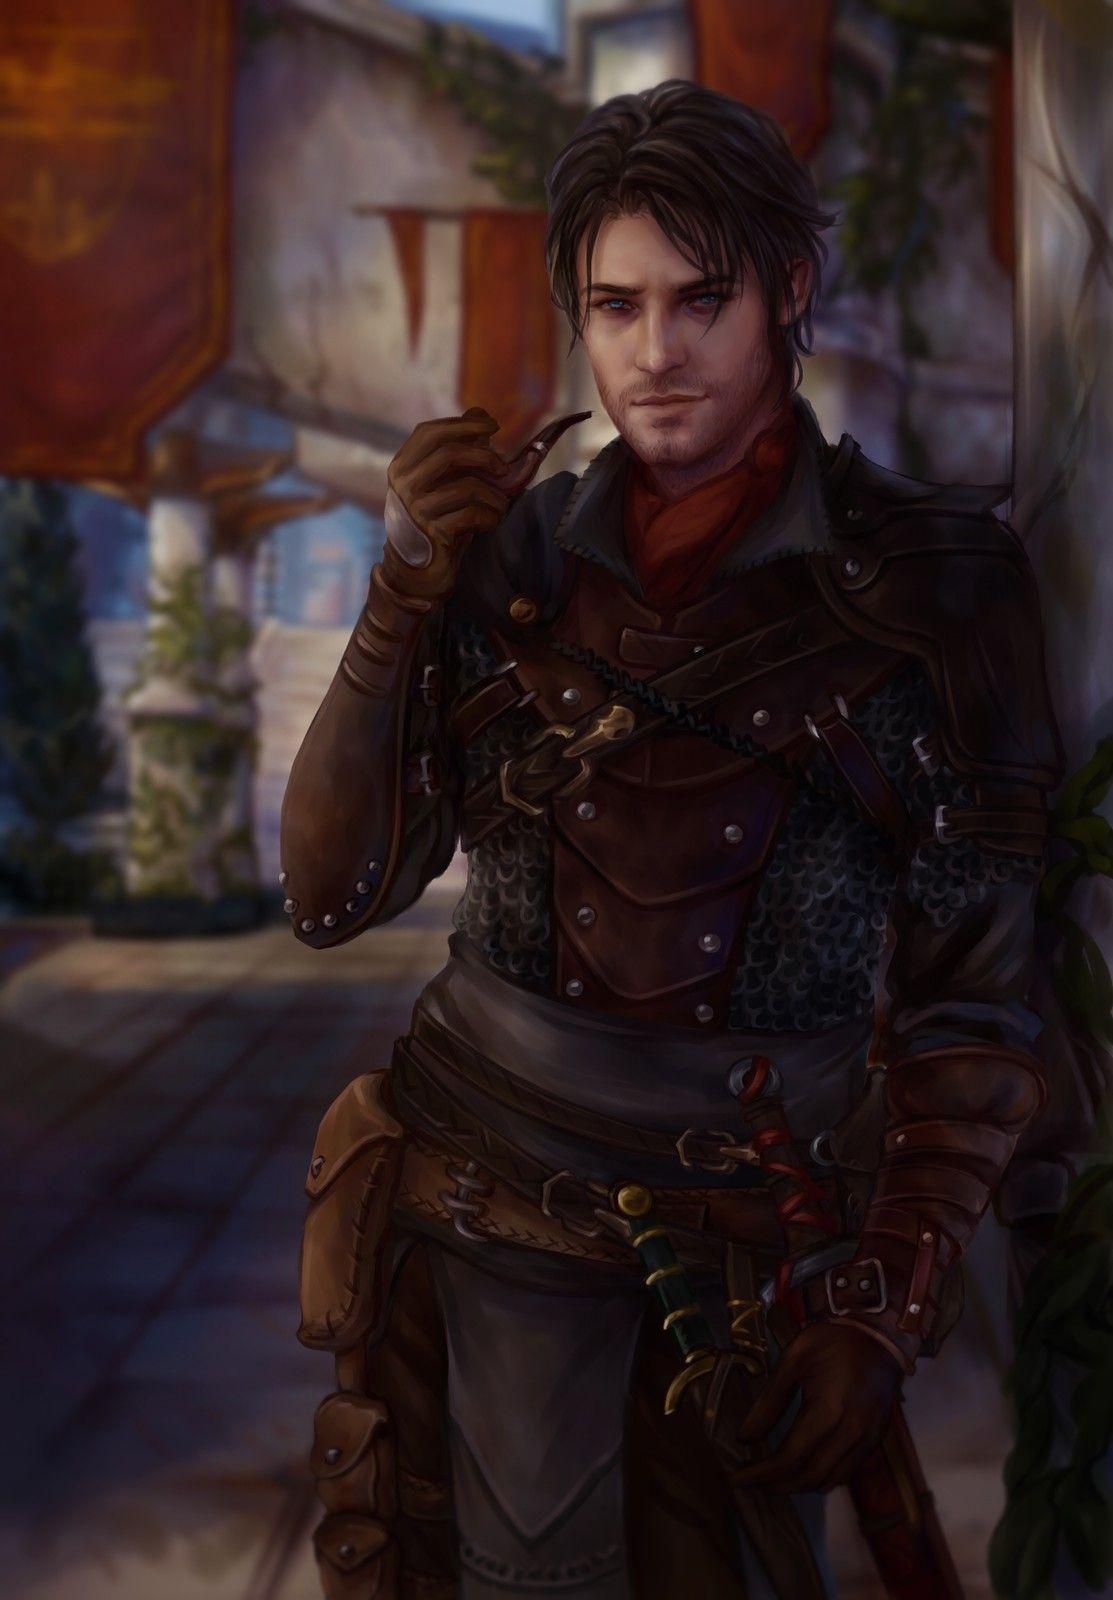 Pin by nerd nerding on war of thrones fantasy characters